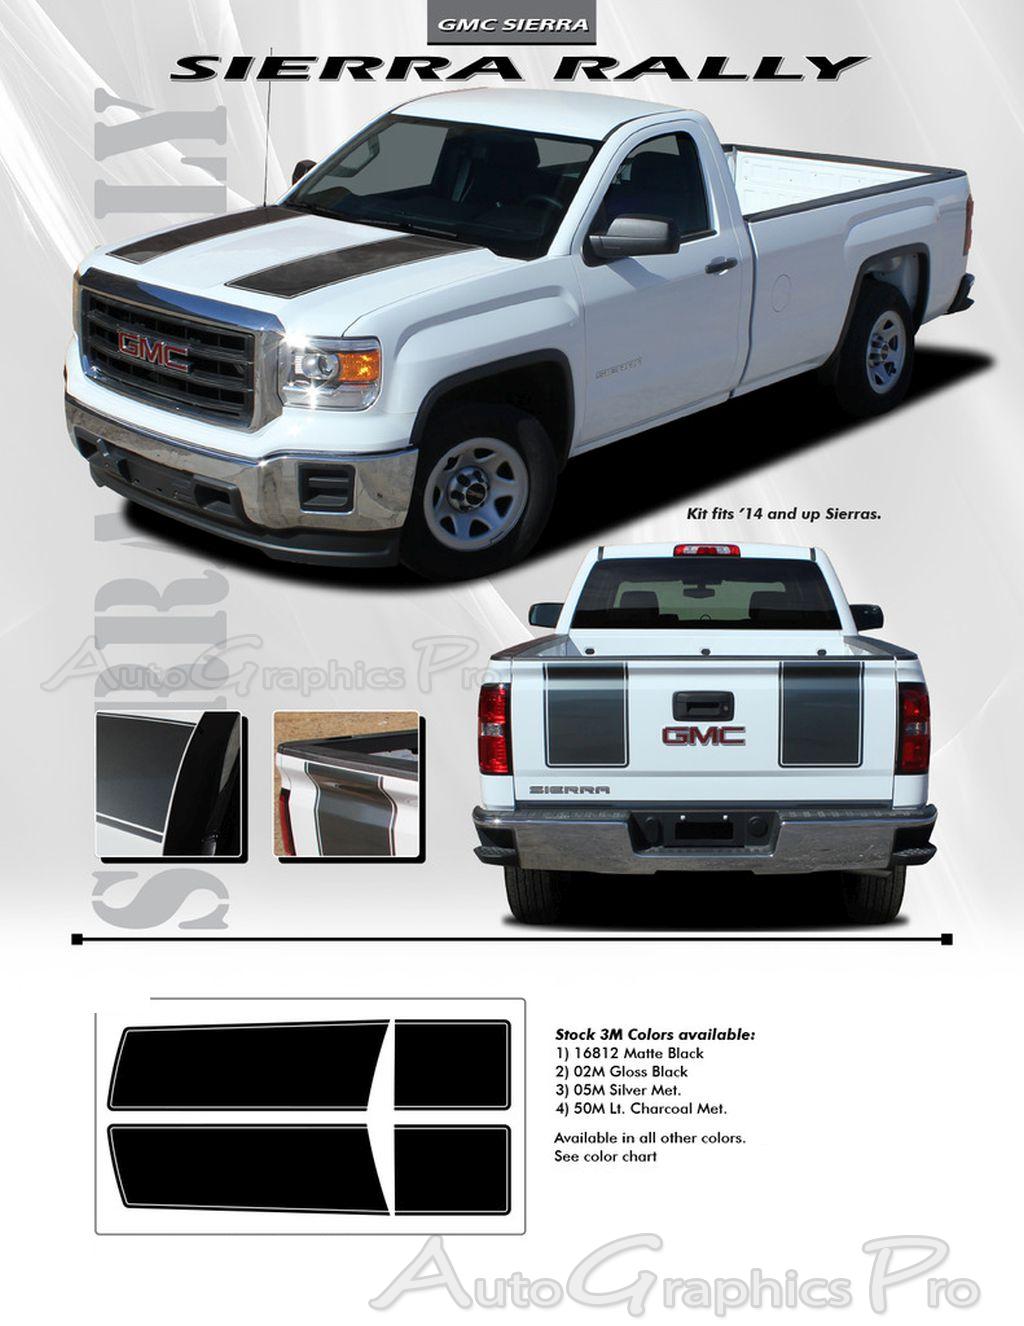 2014 2017 2018 gmc sierra racing stripes rally truck hood decals vinyl graphics kit